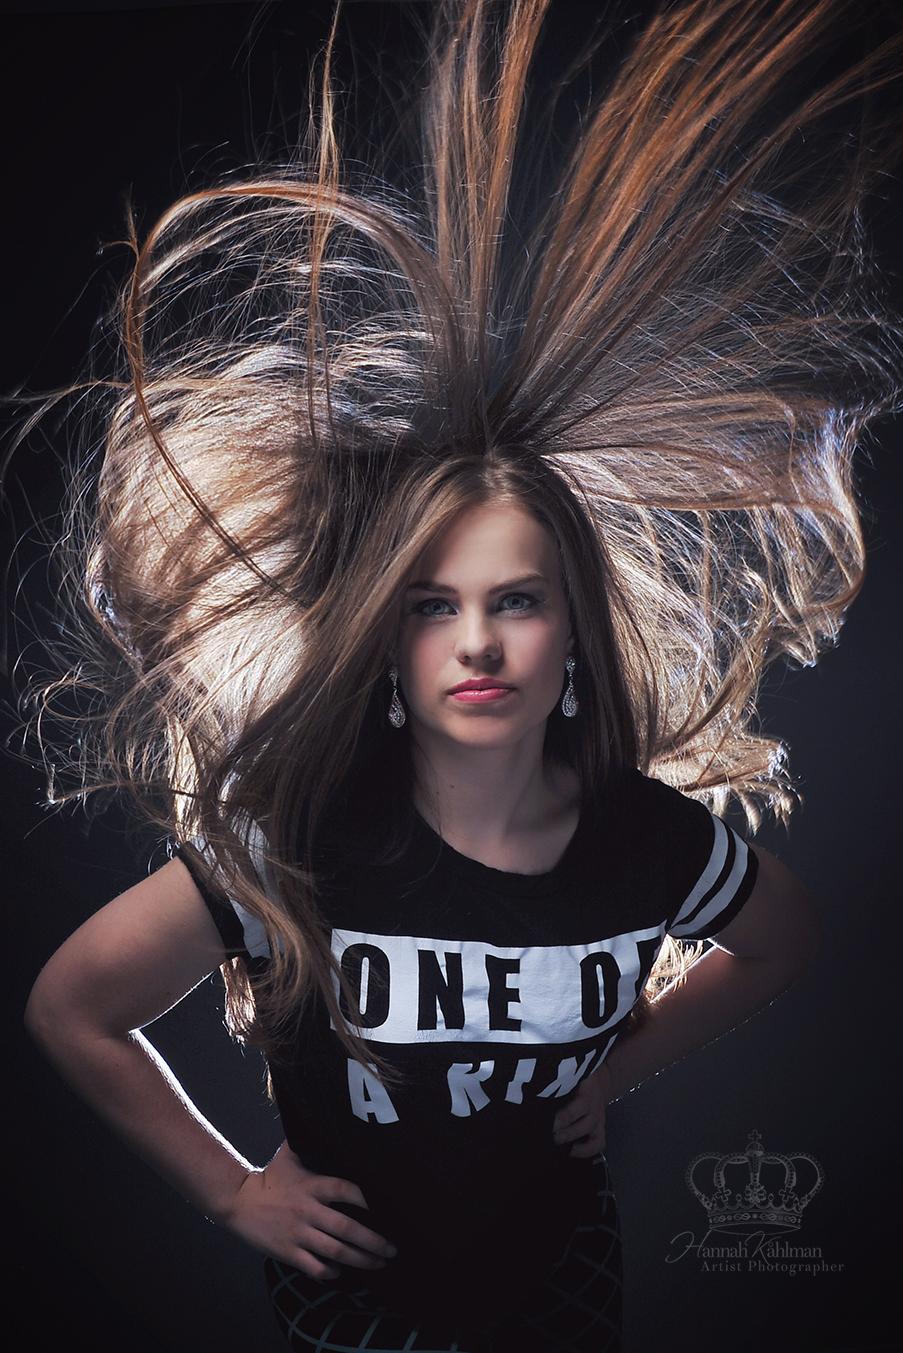 Crazy_hair_Model_Headshot_photographer_A